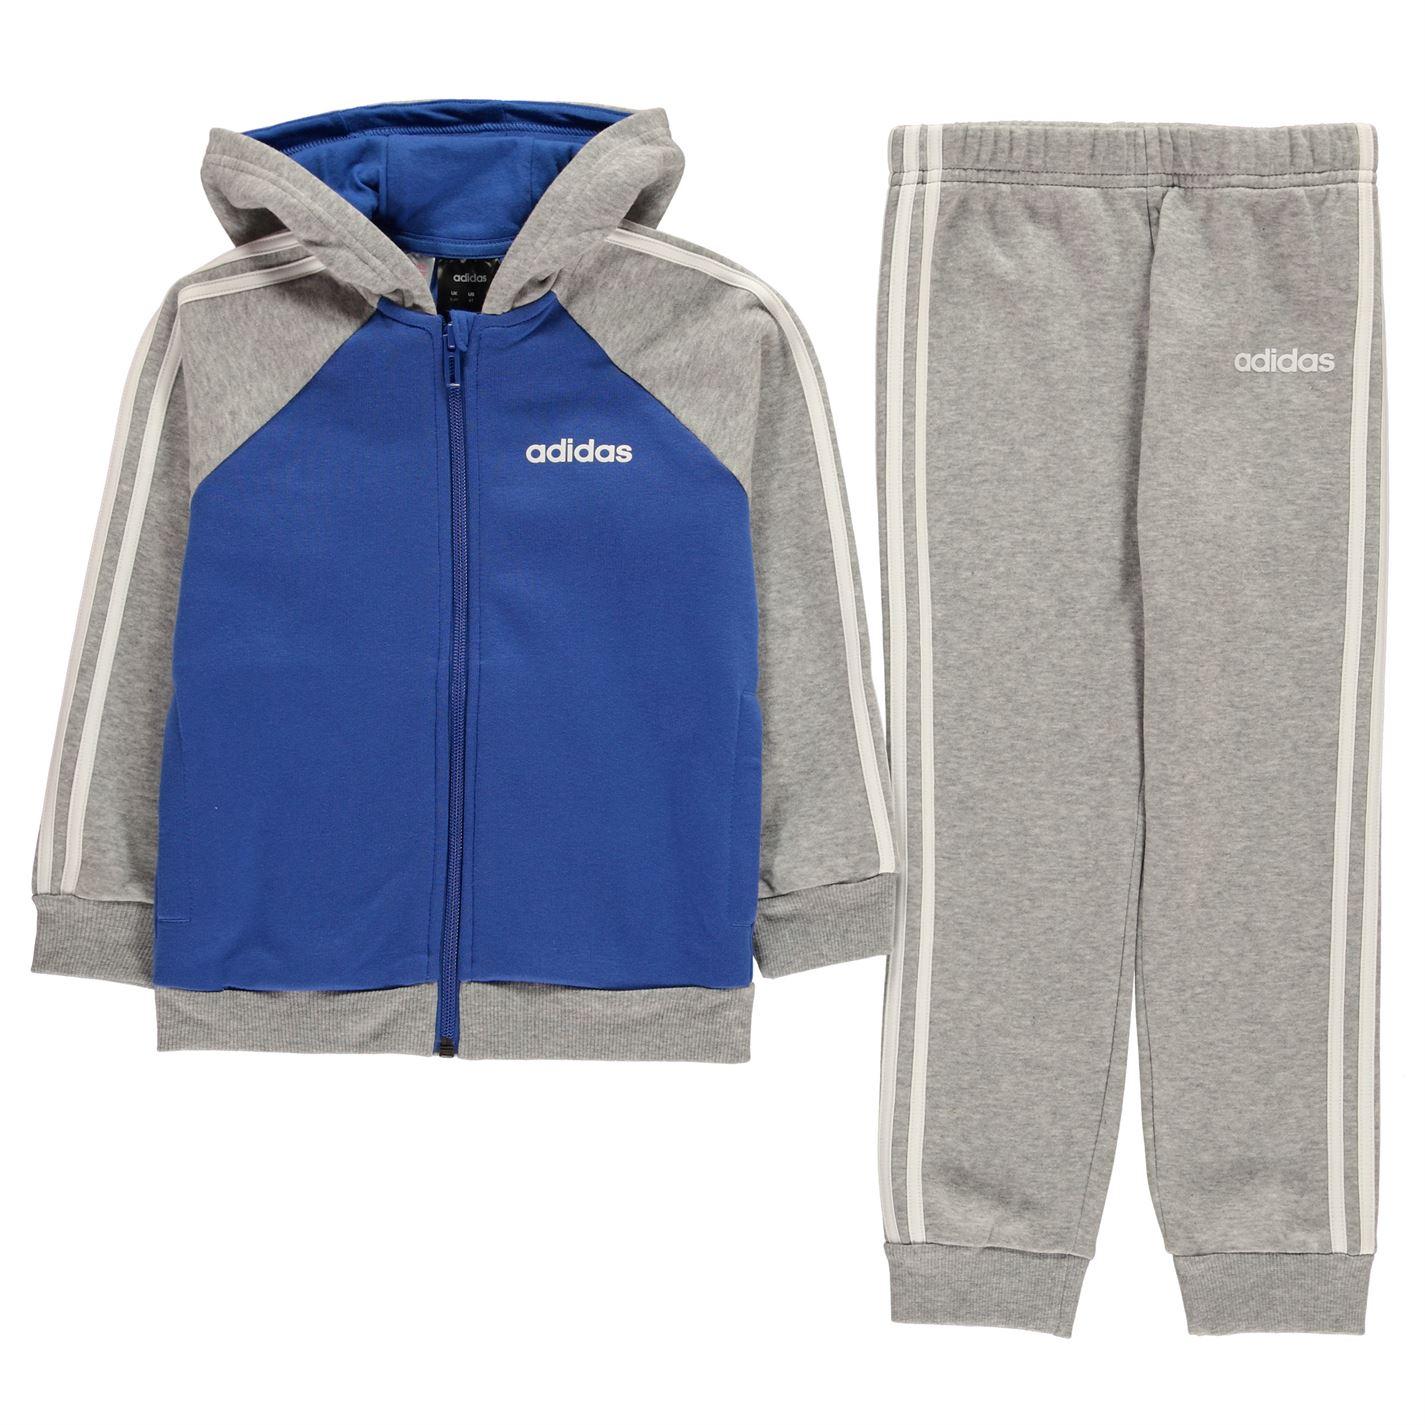 Adidas Kids 3-Stripes Tracksuit Jogger